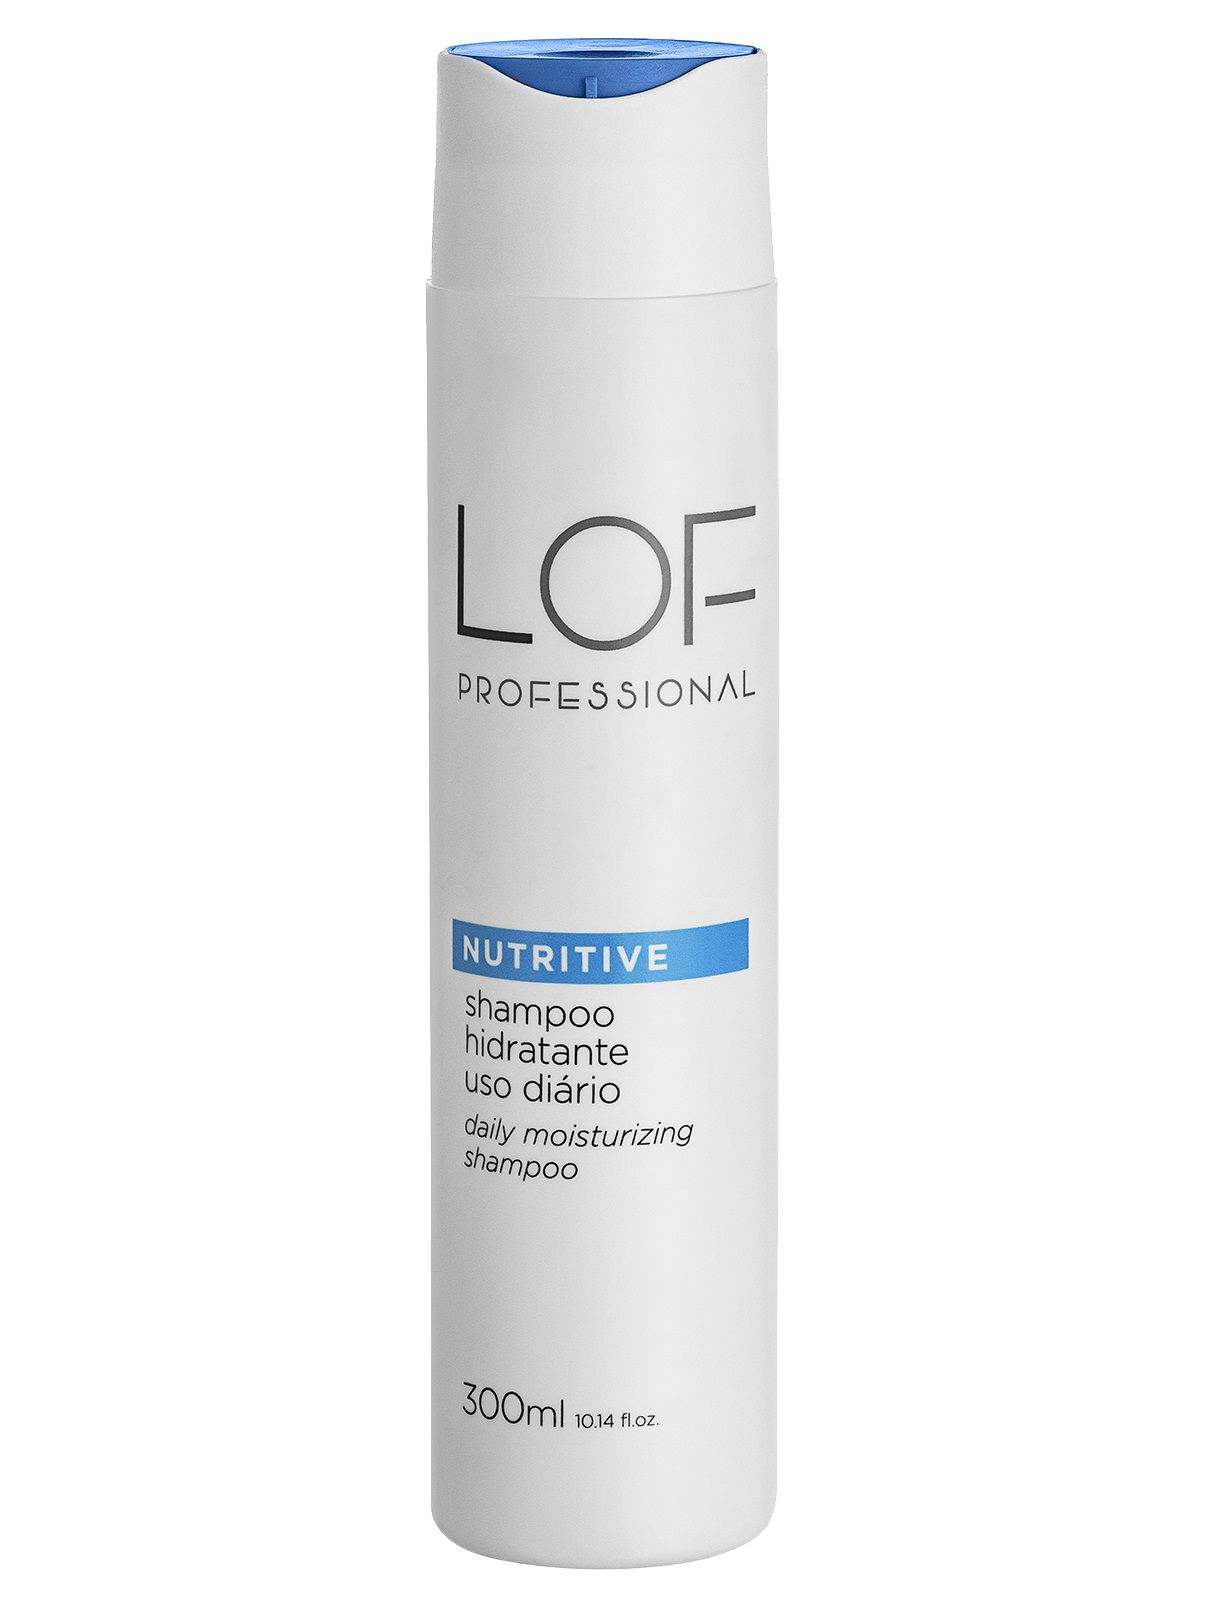 LOF Professional Nutritive - Shampoo